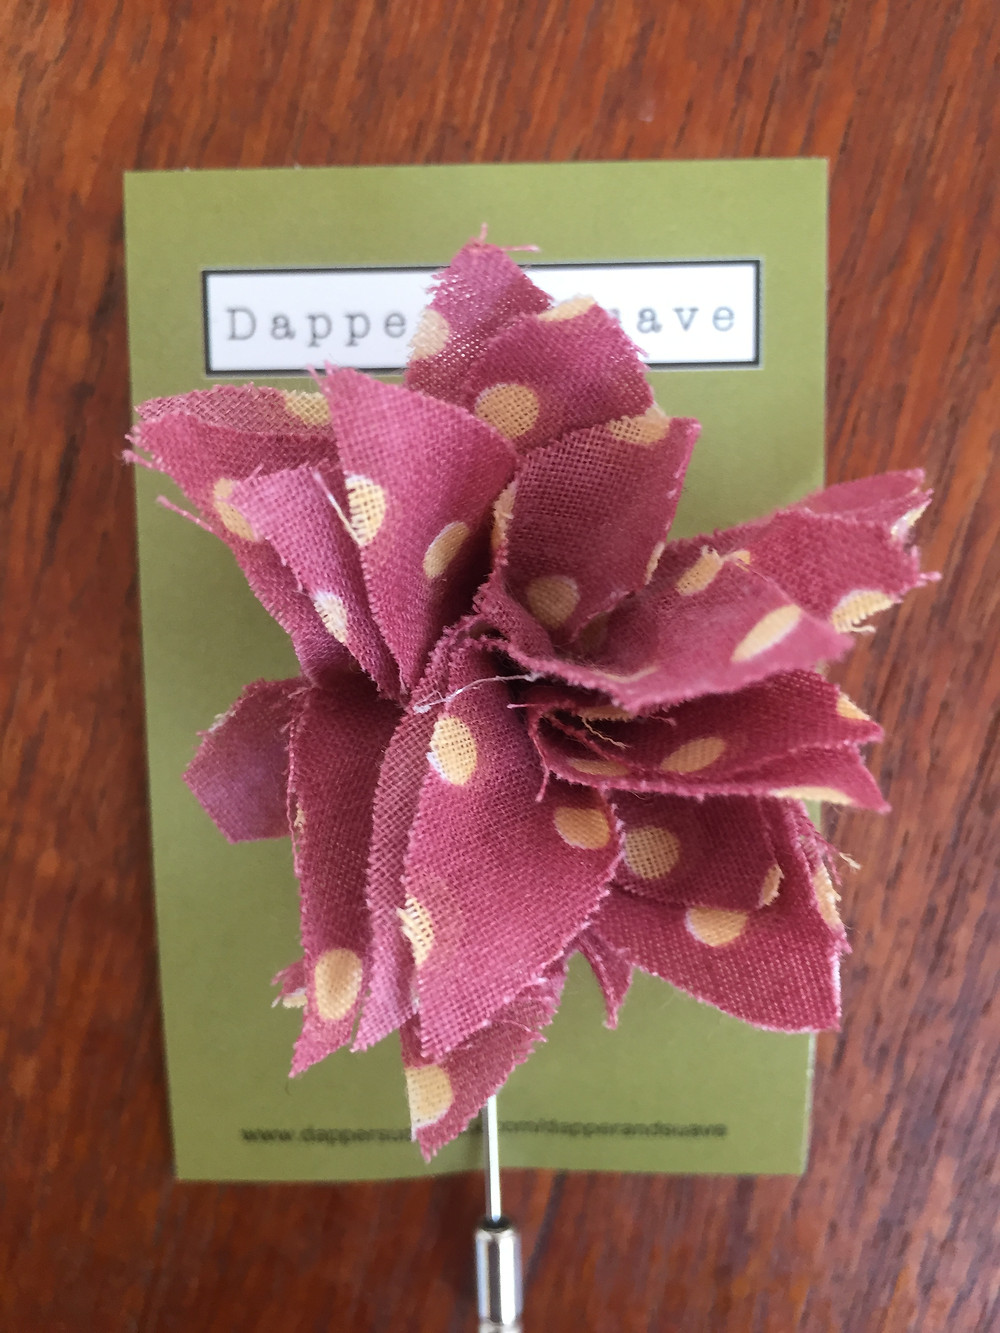 Dapper & Suave Plum Spot Long Lapel Pin